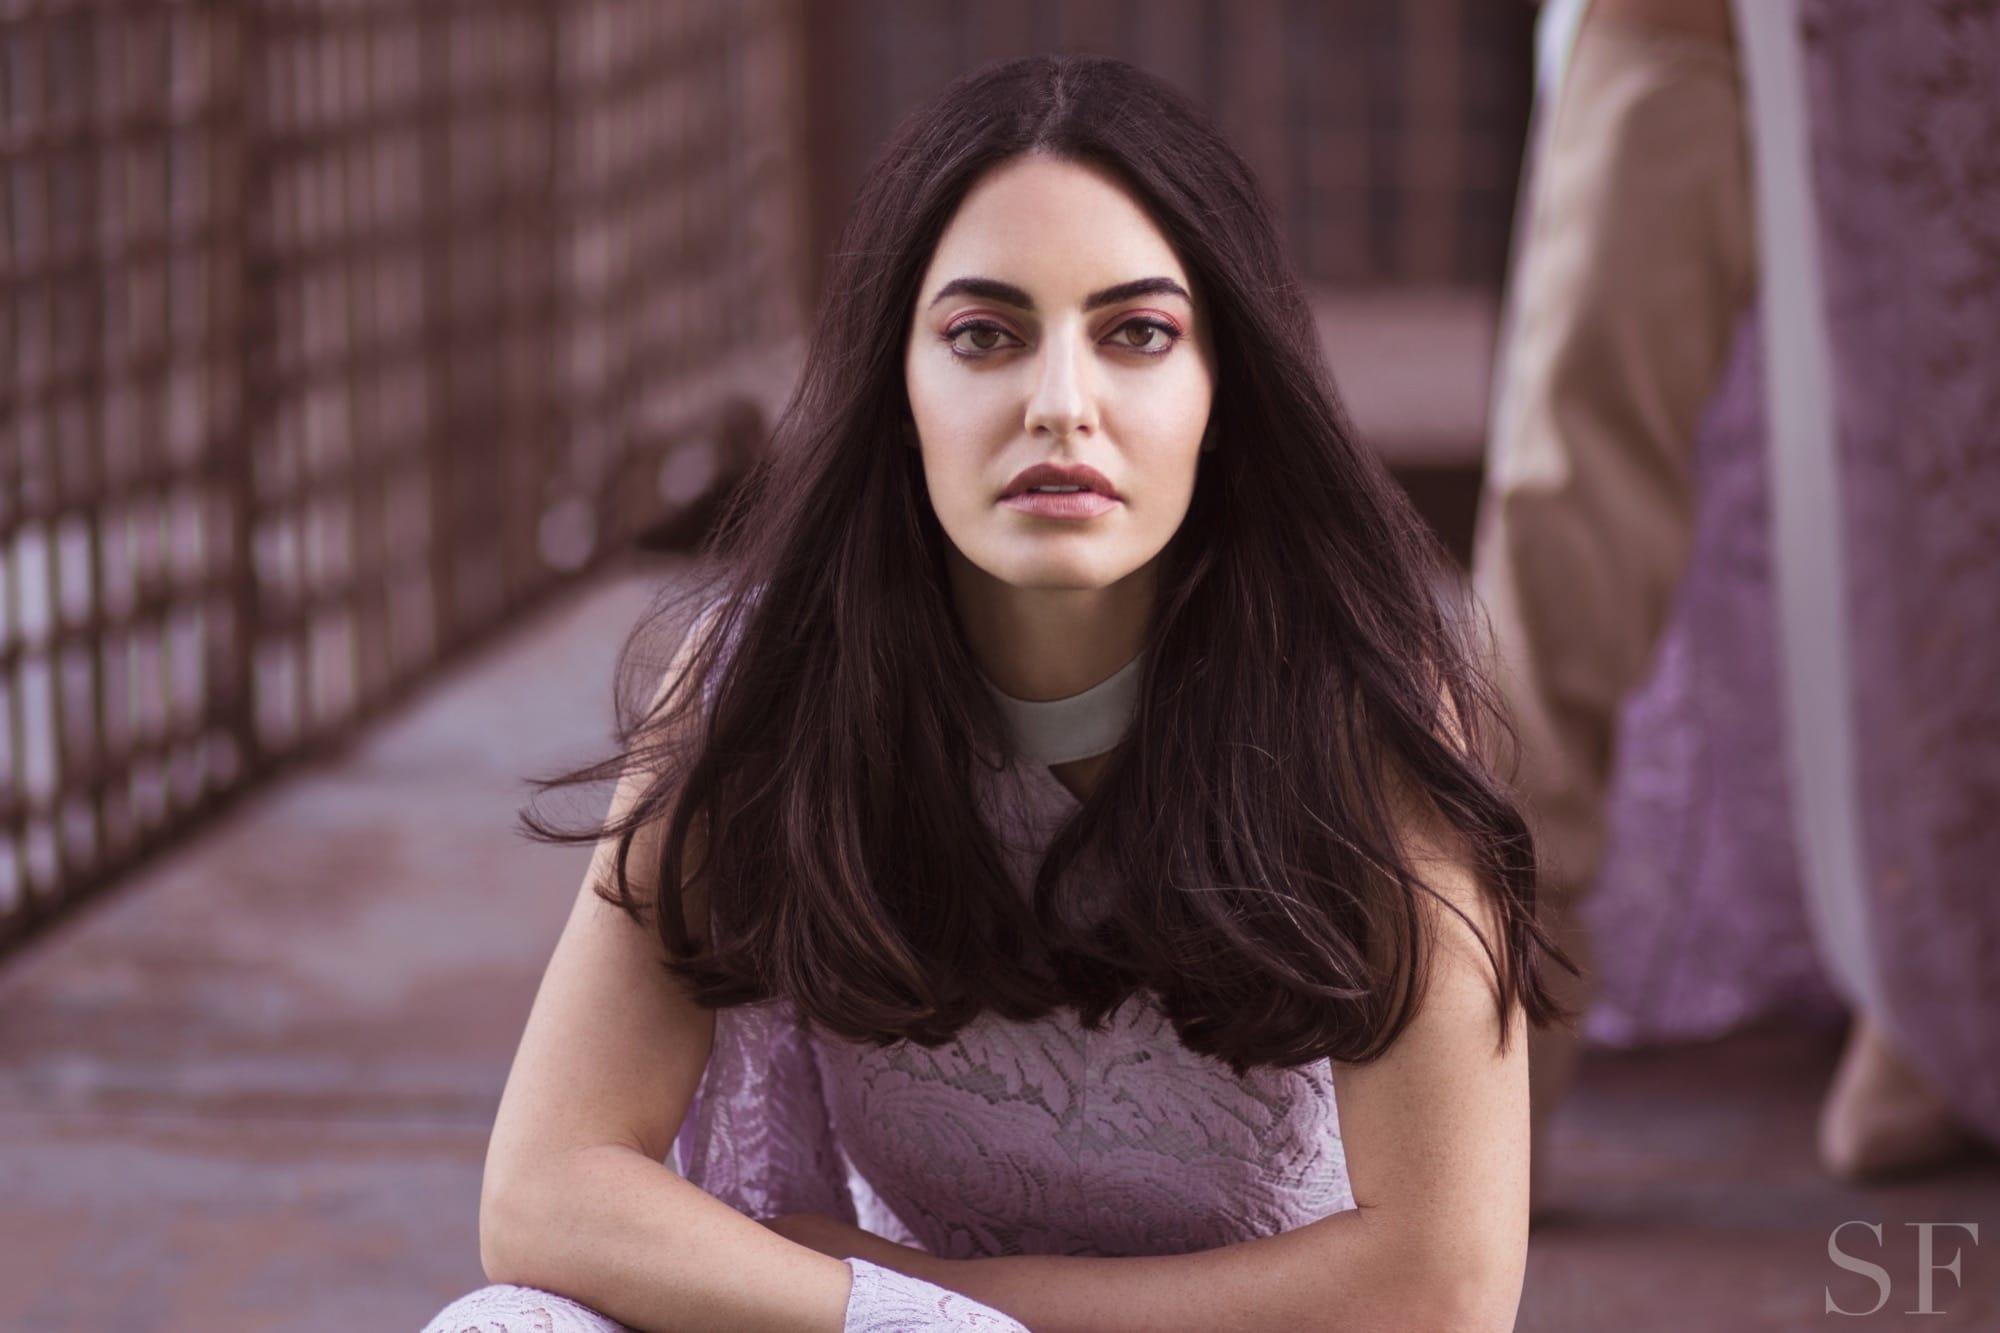 The 4 Best Arab Vloggers on YouTube - Savoir Flair